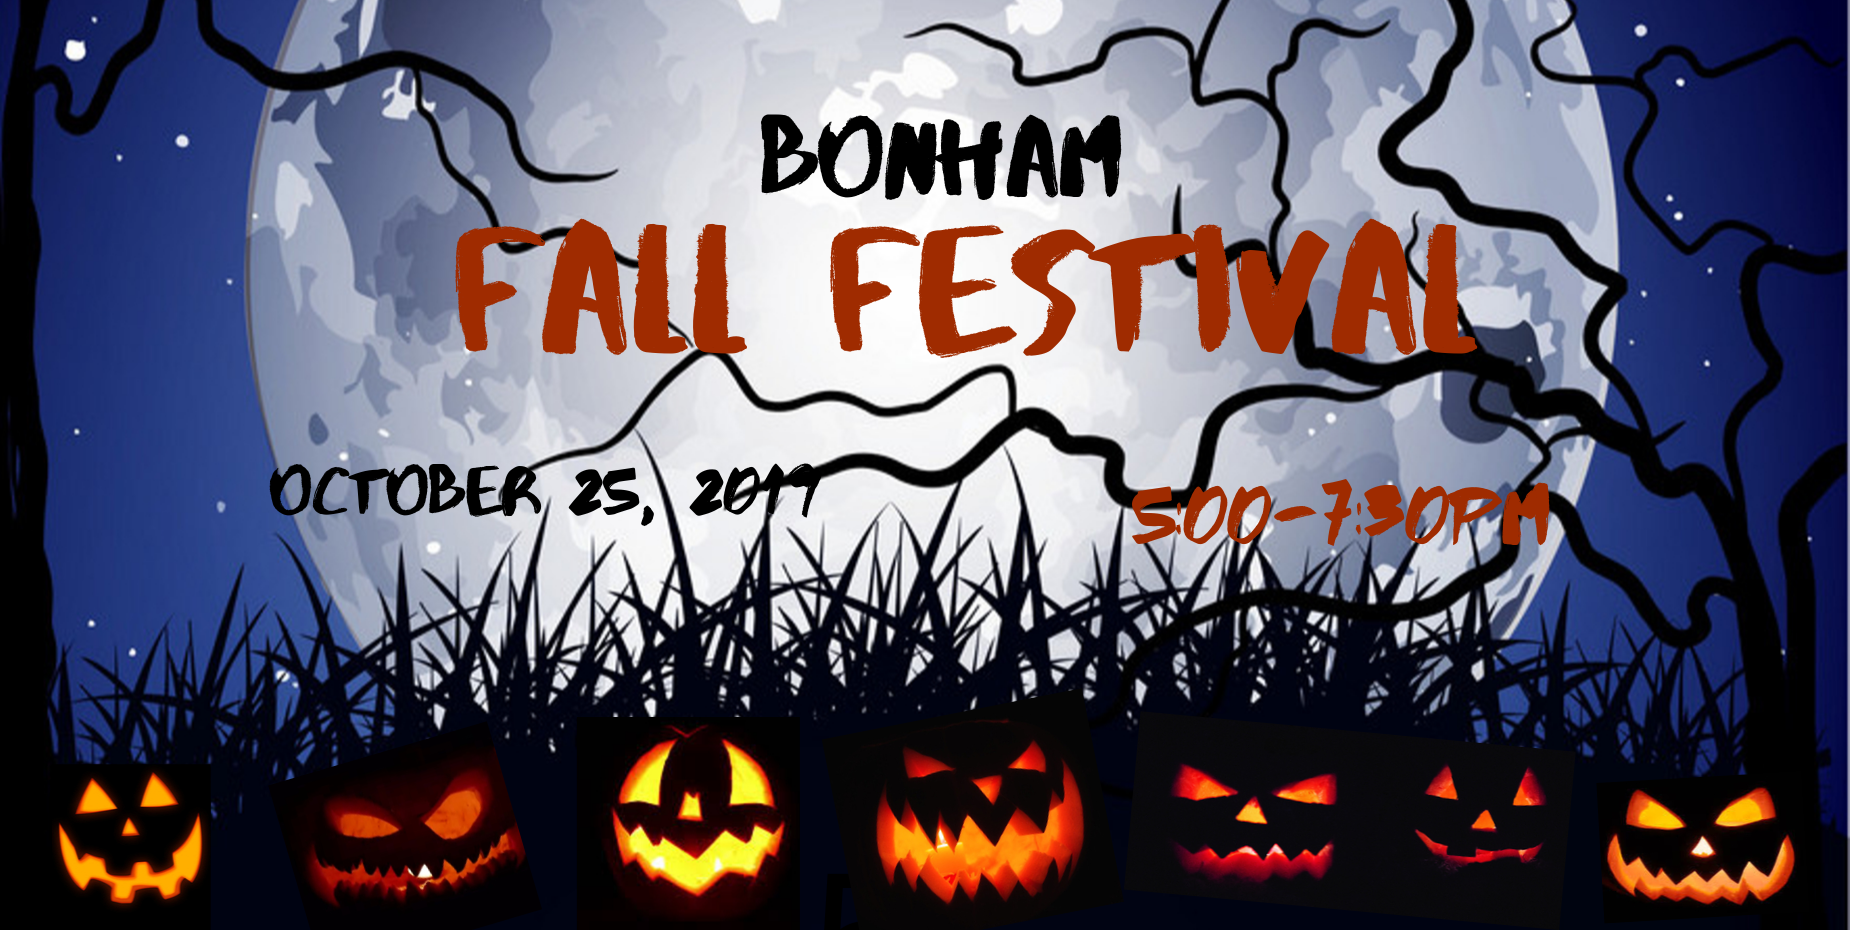 Fall Festival Oct. 25th